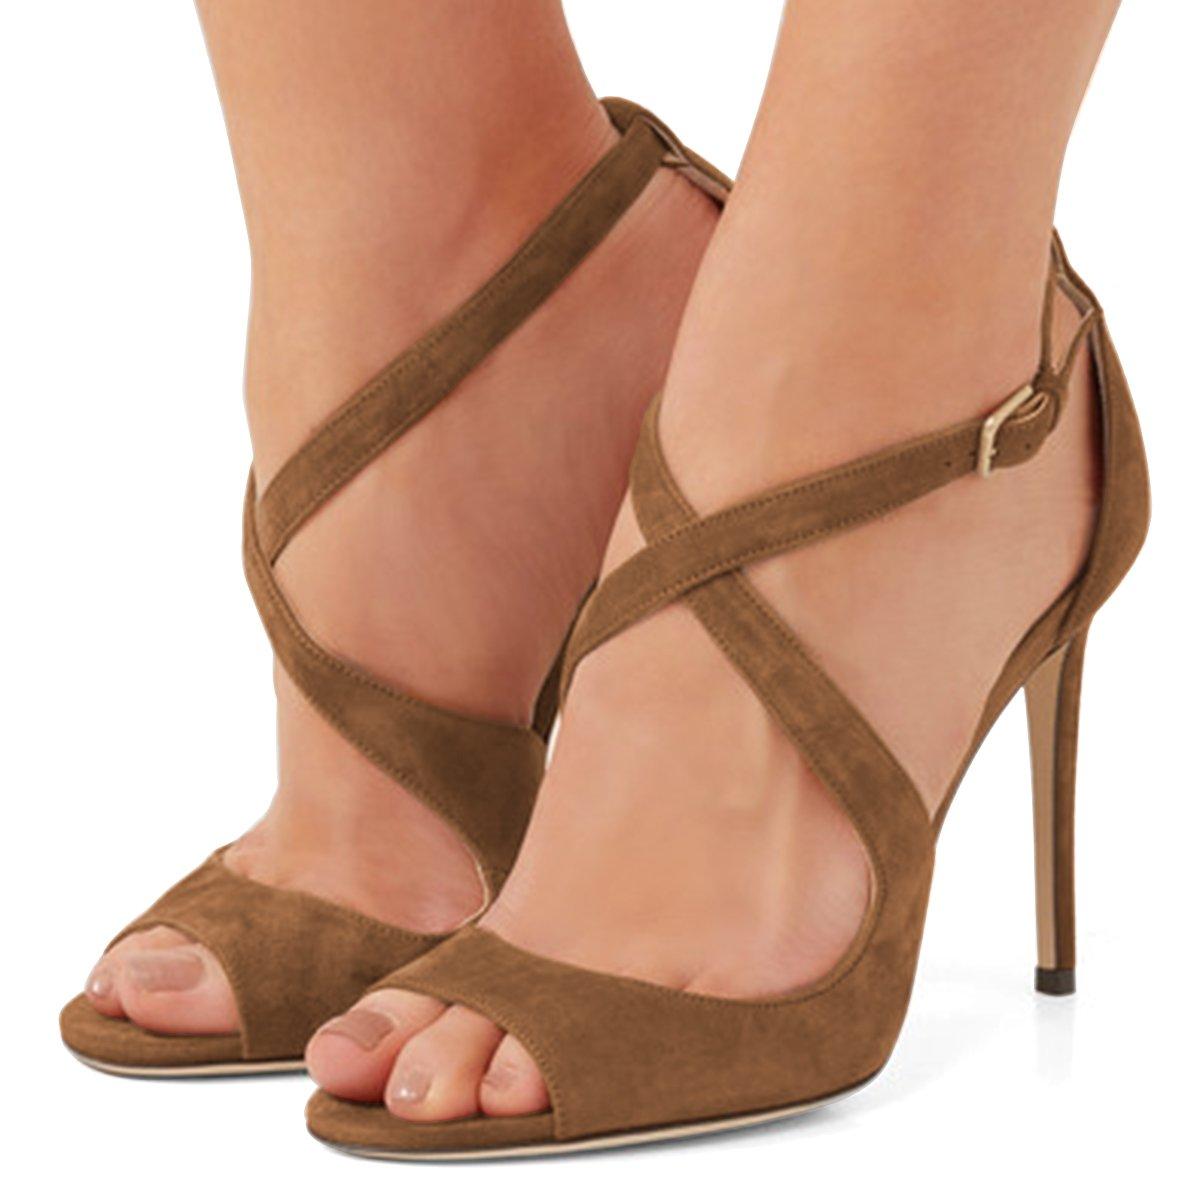 FSJ Women Sexy Faux Suede Sandals Peep Toe Stiletto Heels Pumps Cross Strap Cutout Shoes Size 4-15 US B079Z62FJ4 15 B(M) US|Brown